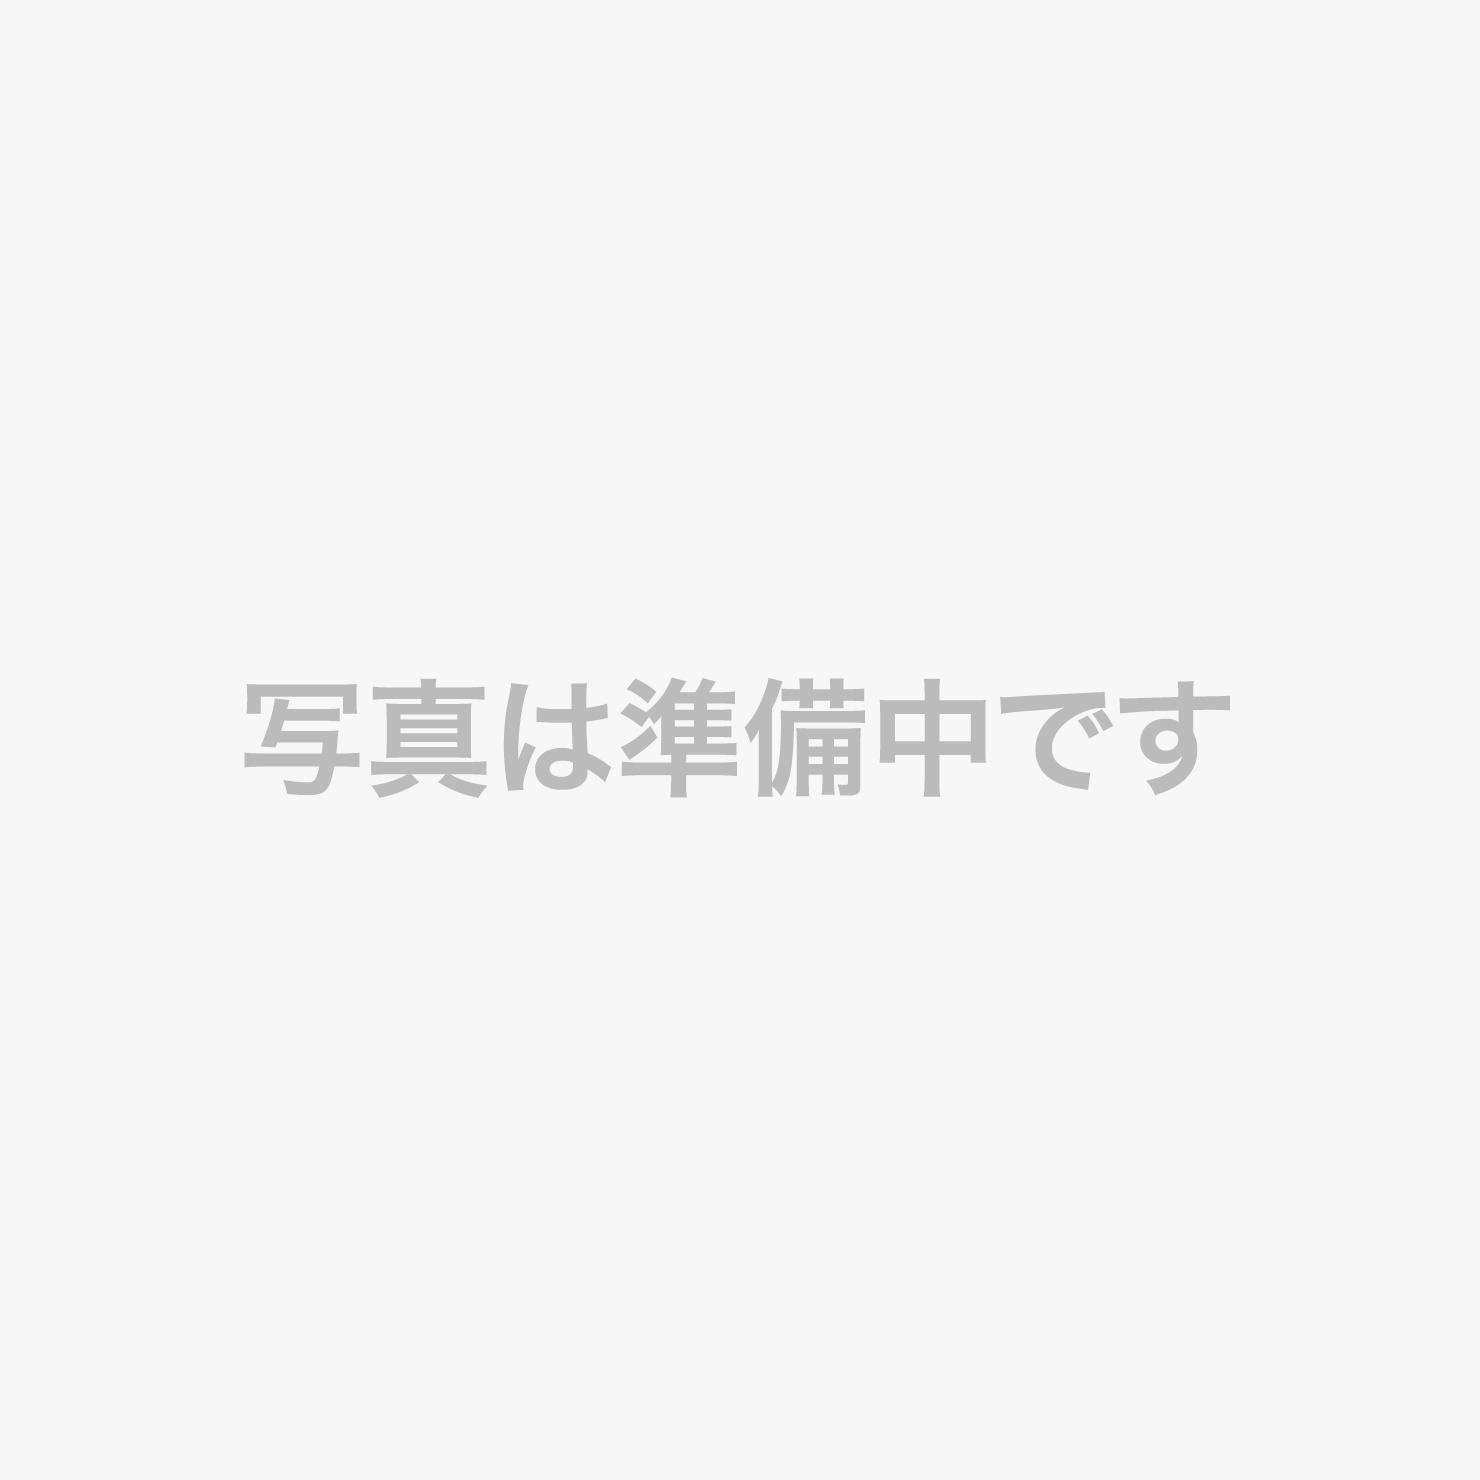 ++nature dining++ 下田東急ホテルなら【絶景+nature wedding】